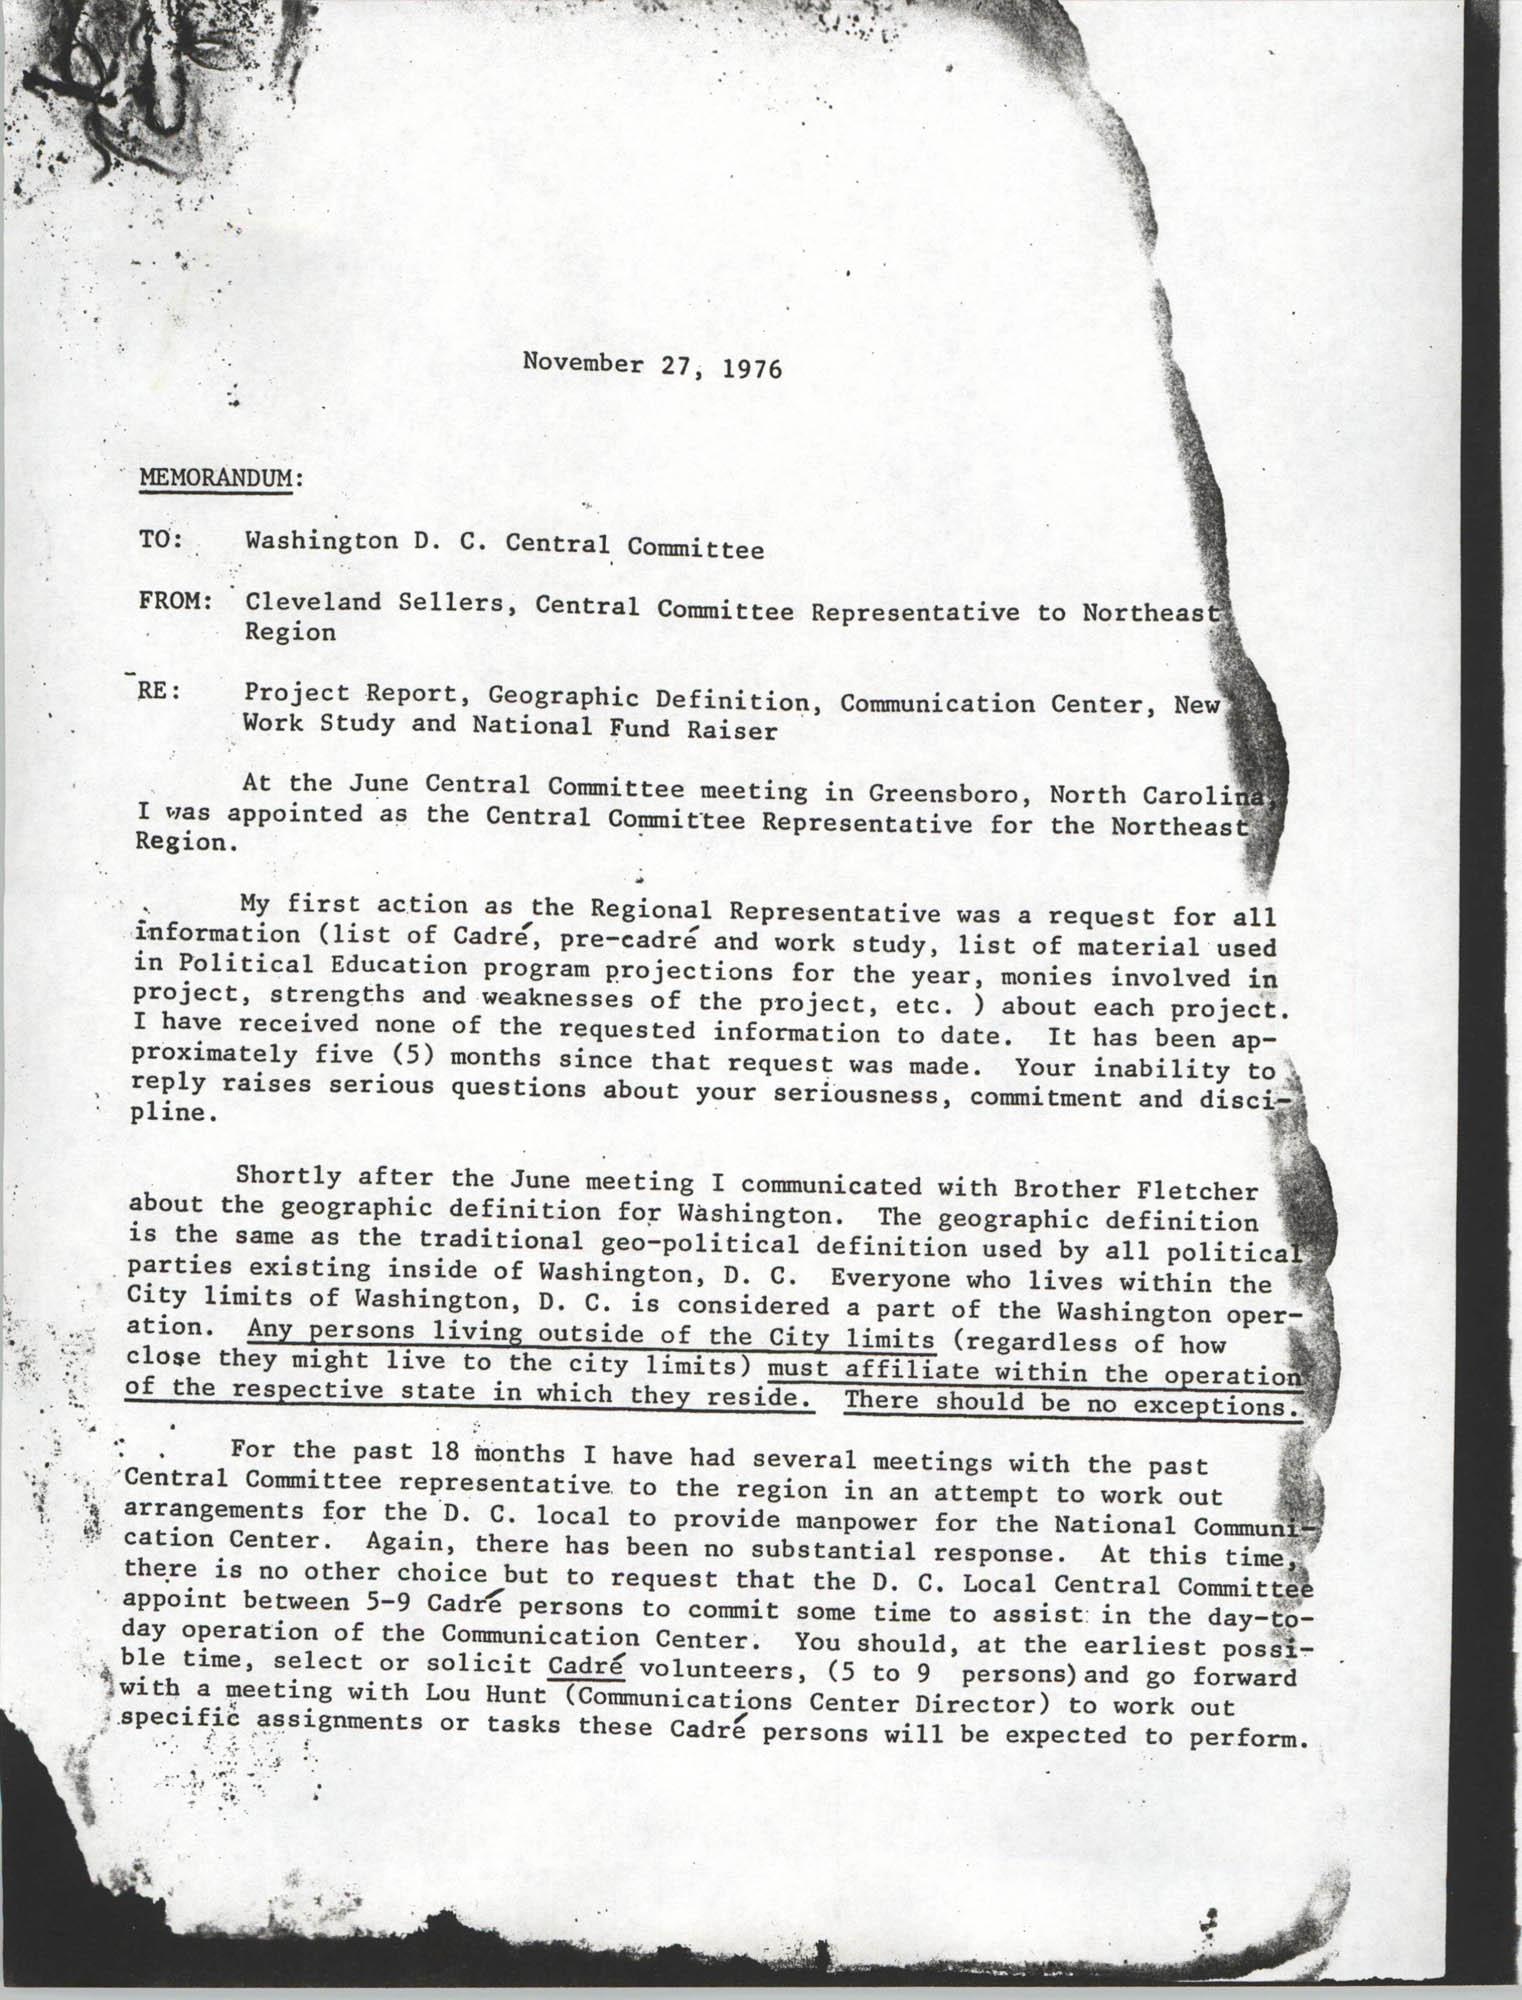 Memorandum from Cleveland Sellers, November 27, 1976